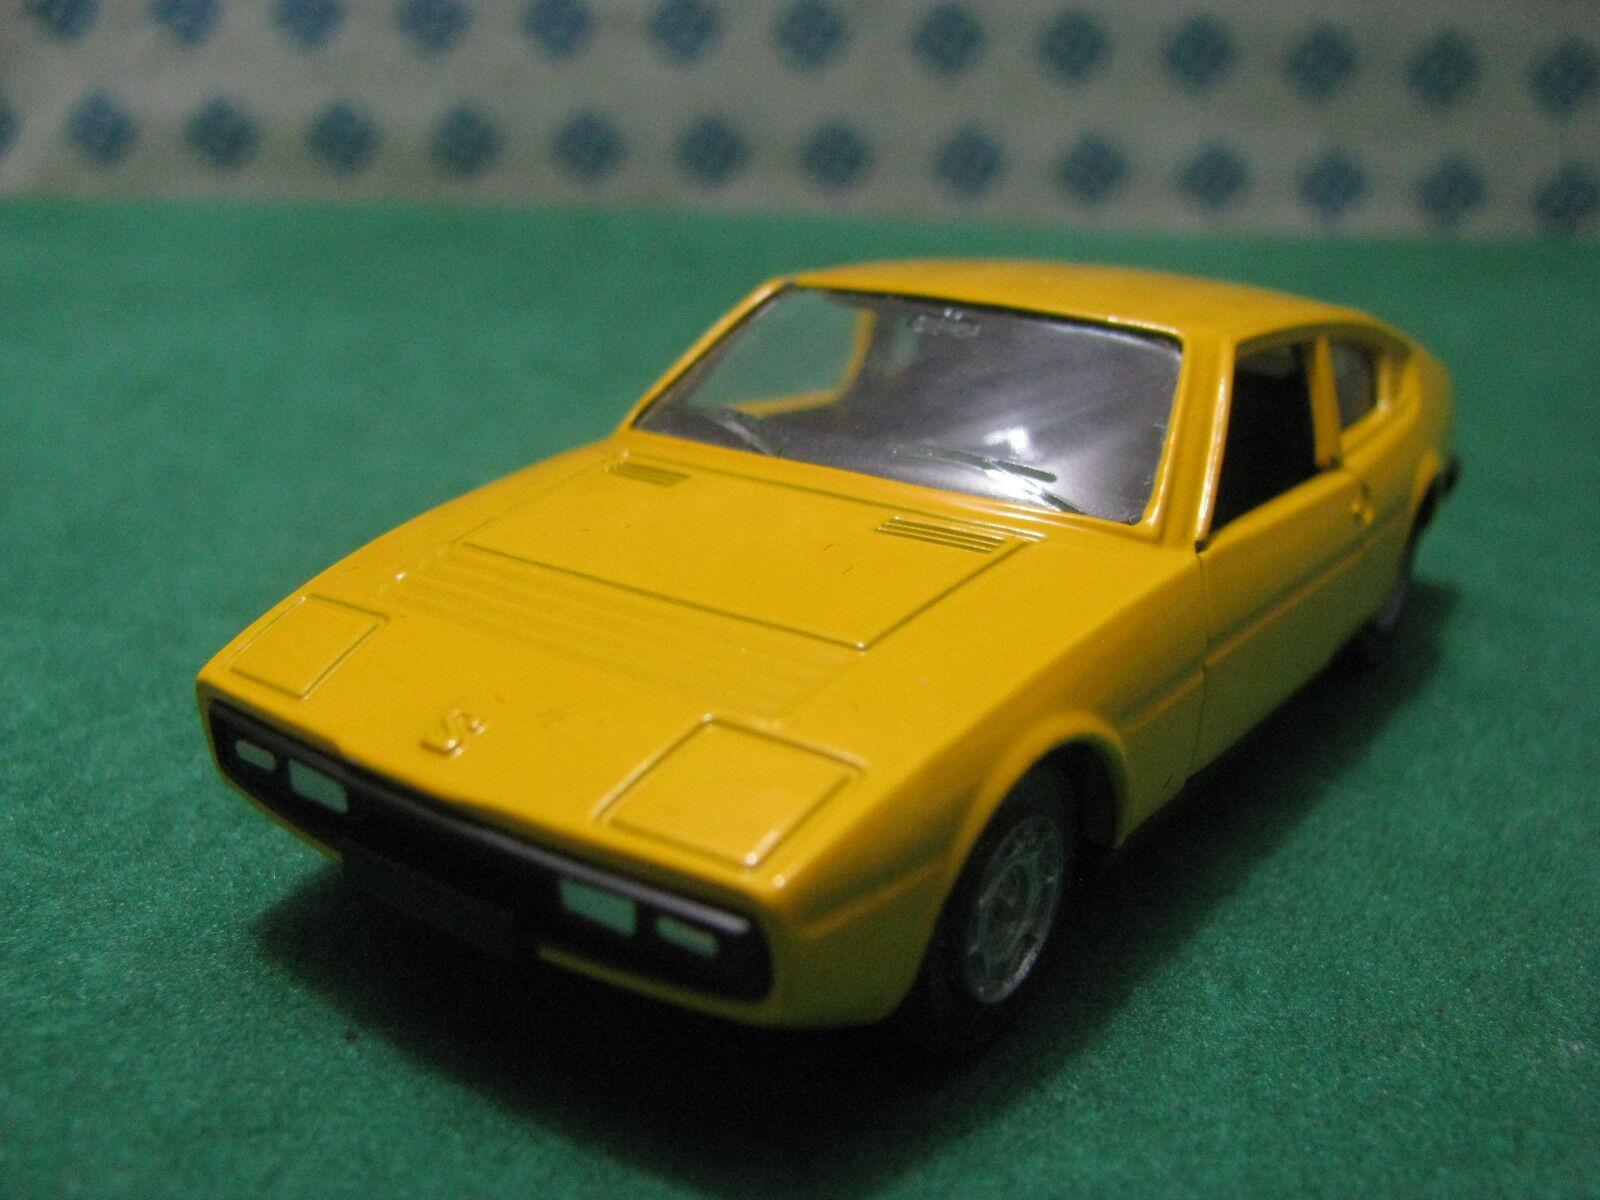 Vintage-Matra-Simca BAGHERA - 1 43 auto-Pilen